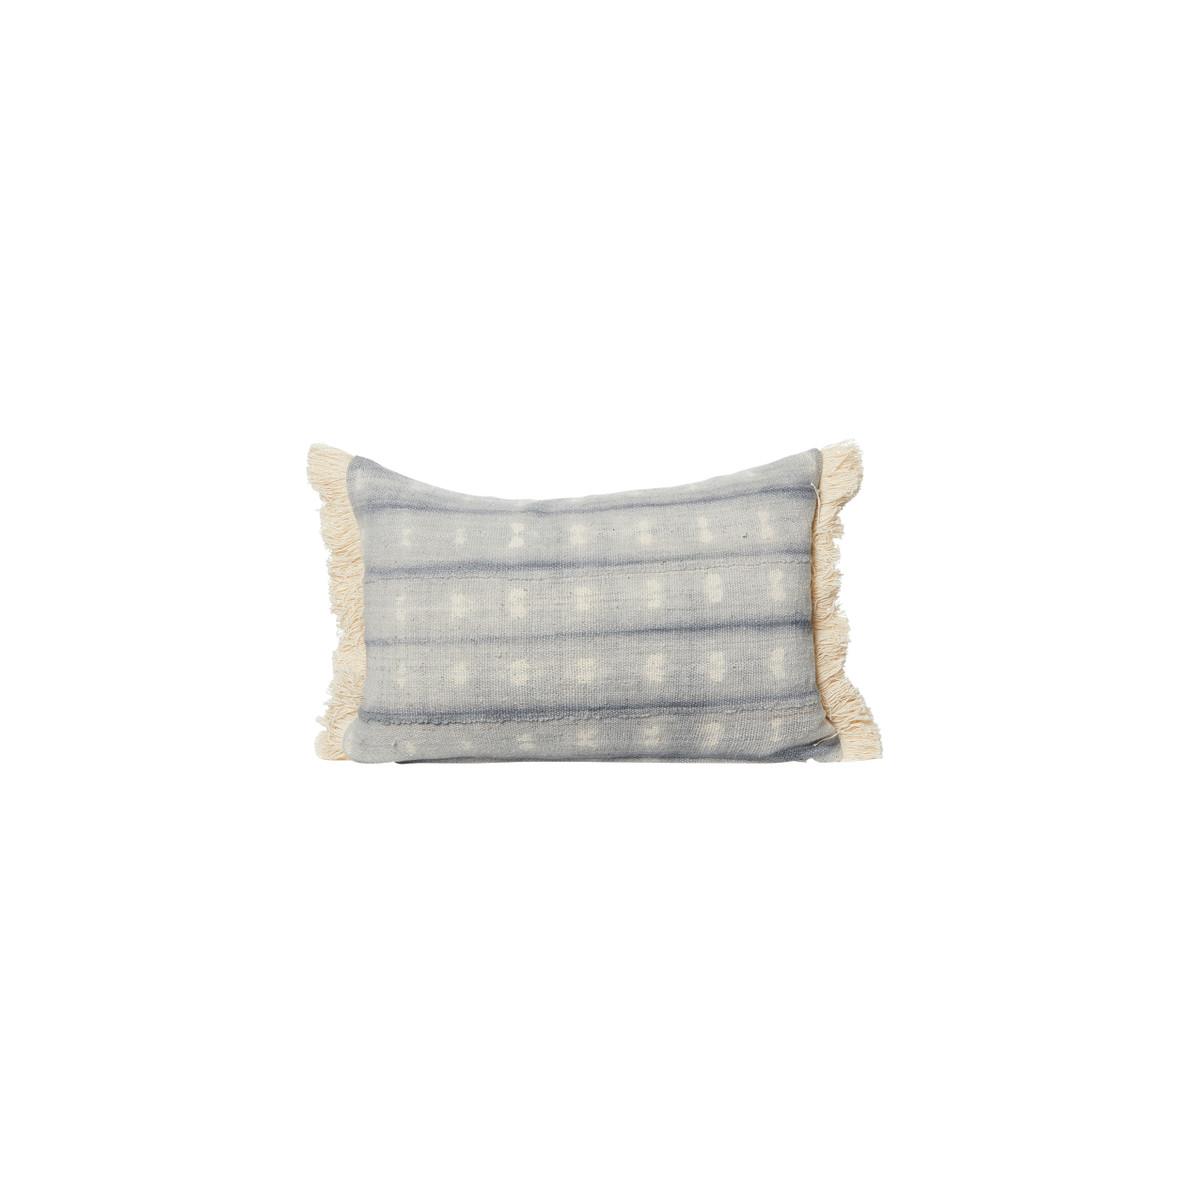 Drew Gray Tie Dye Mud Cloth Pillow - Front